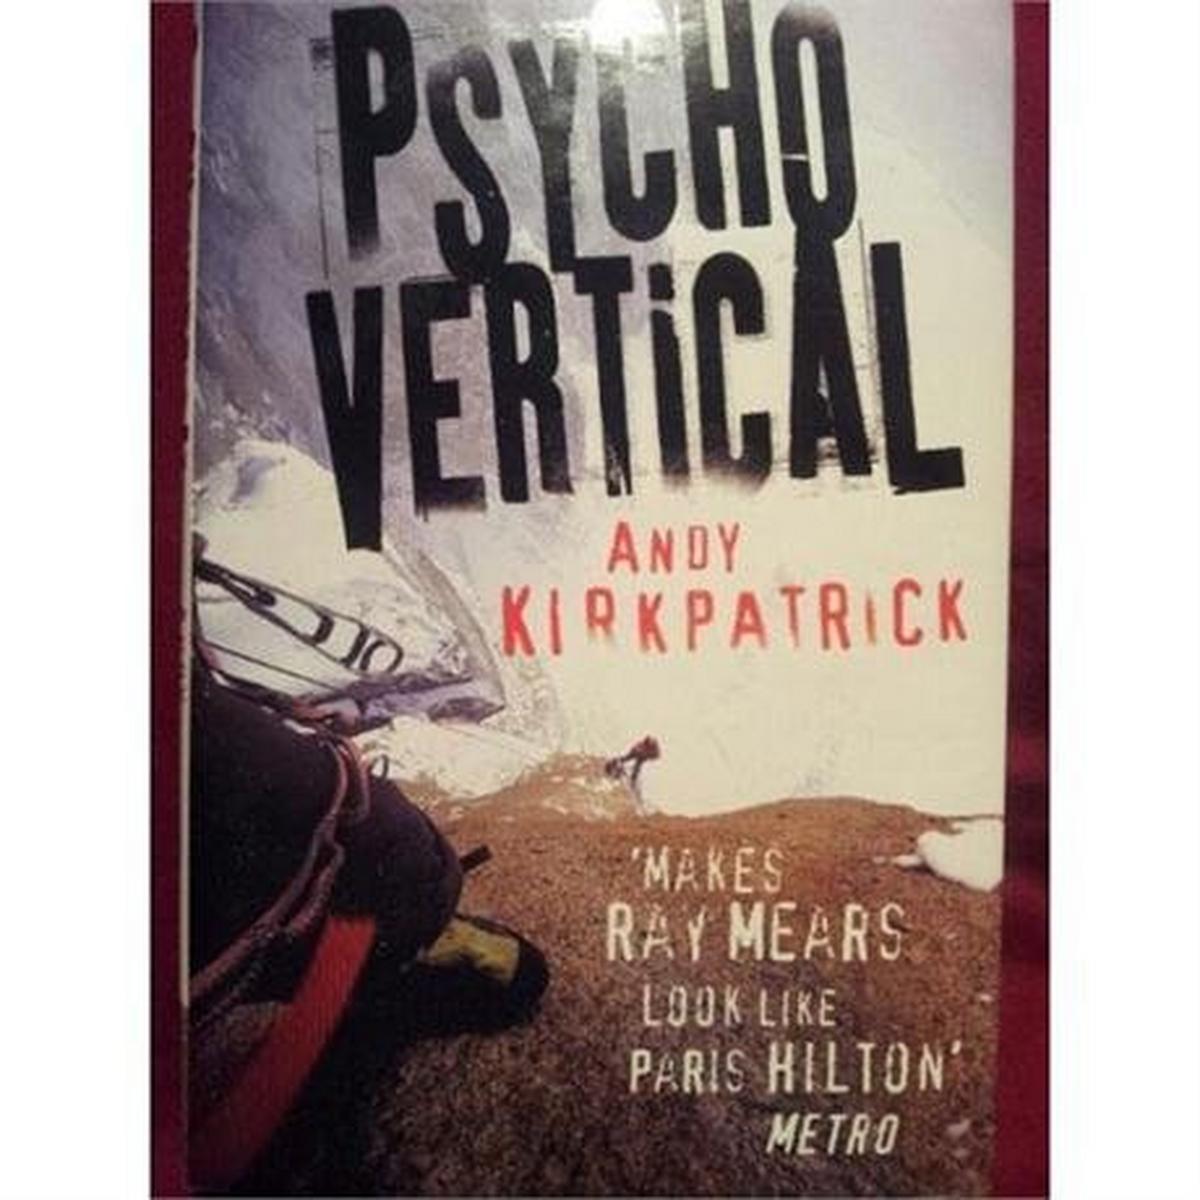 Miscellaneous Book: Psycho Vertical: Kirkpatrick